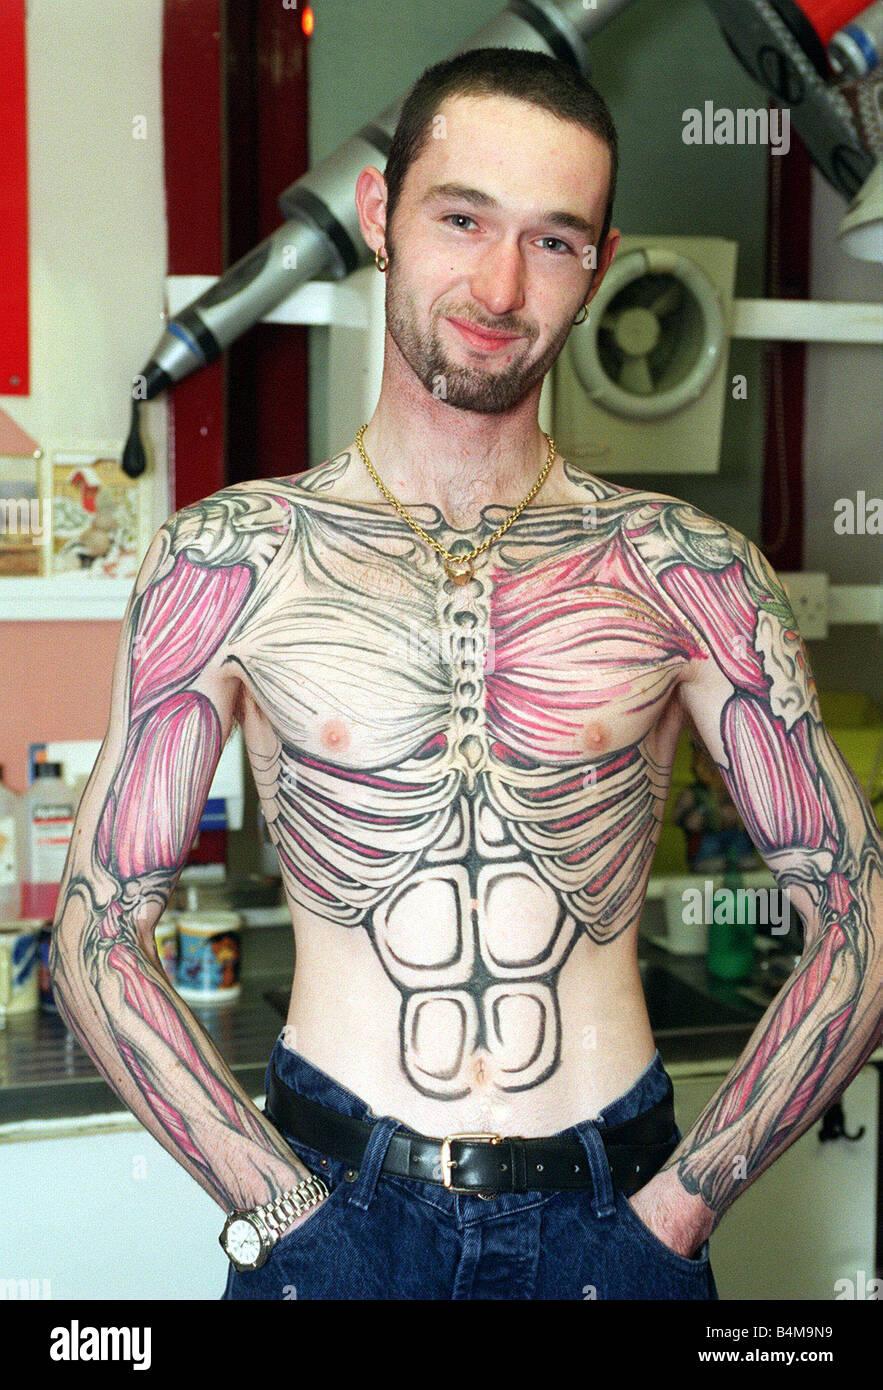 Alan Graham und sein Skelett Körper tattoo 1997 Stockfoto, Bild ...